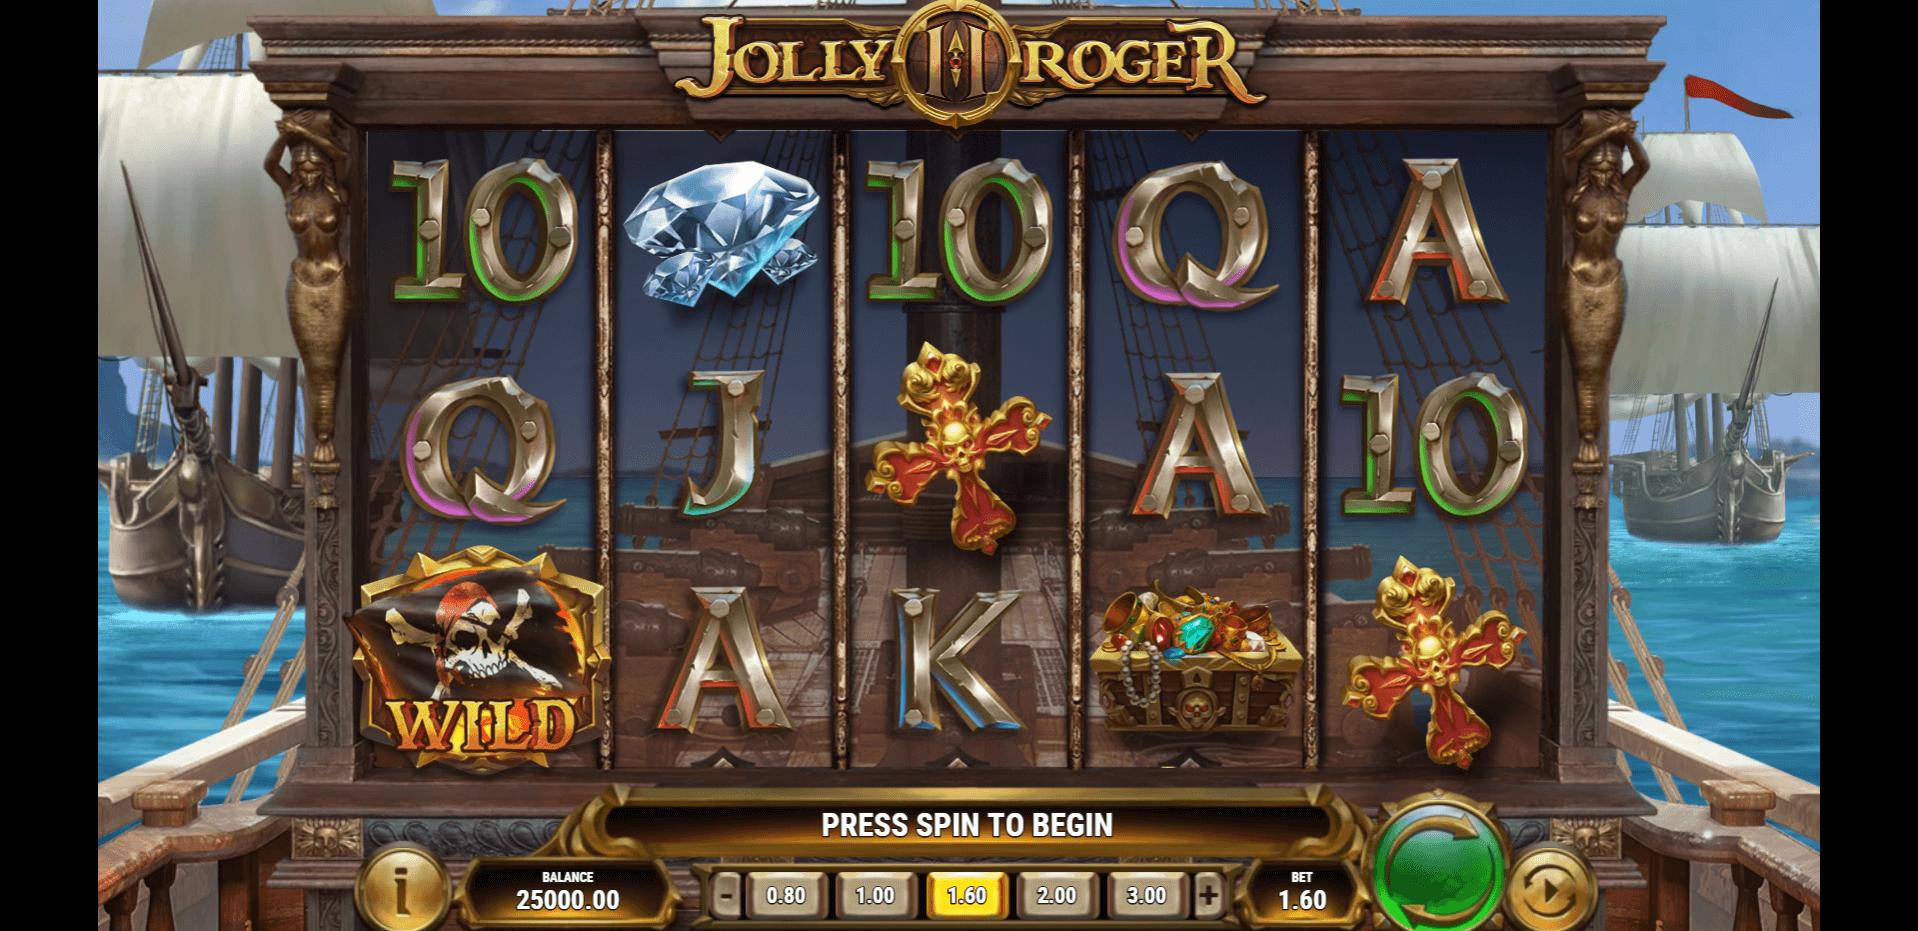 Jolly Roger 2 slot machine screenshot